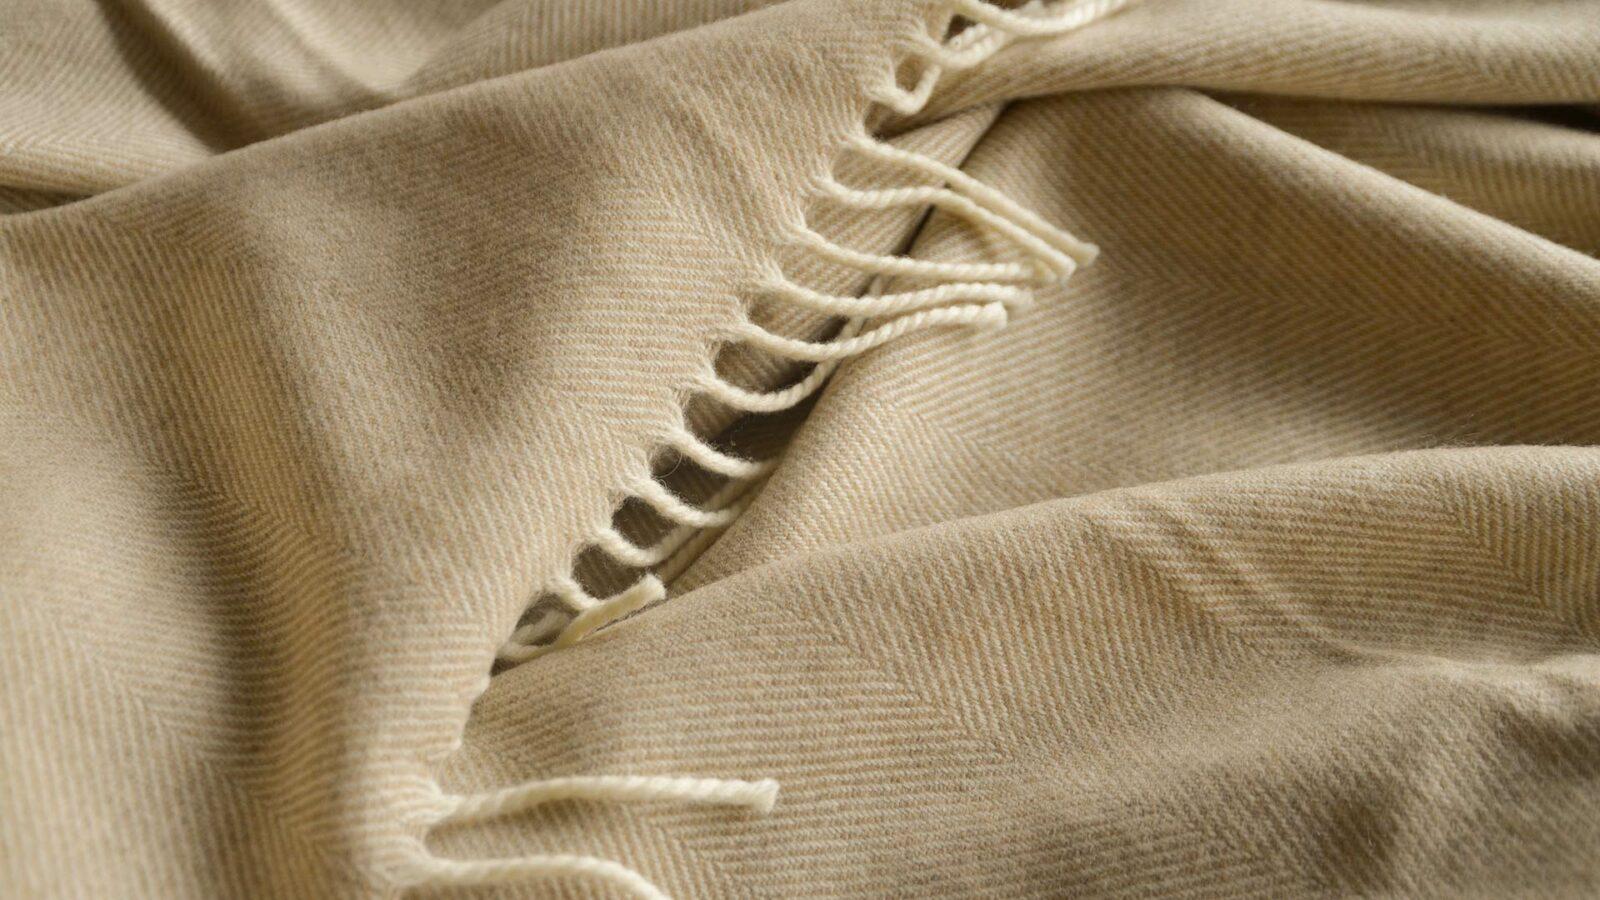 soft merino wool herringbone weave blanket in beige and ivory